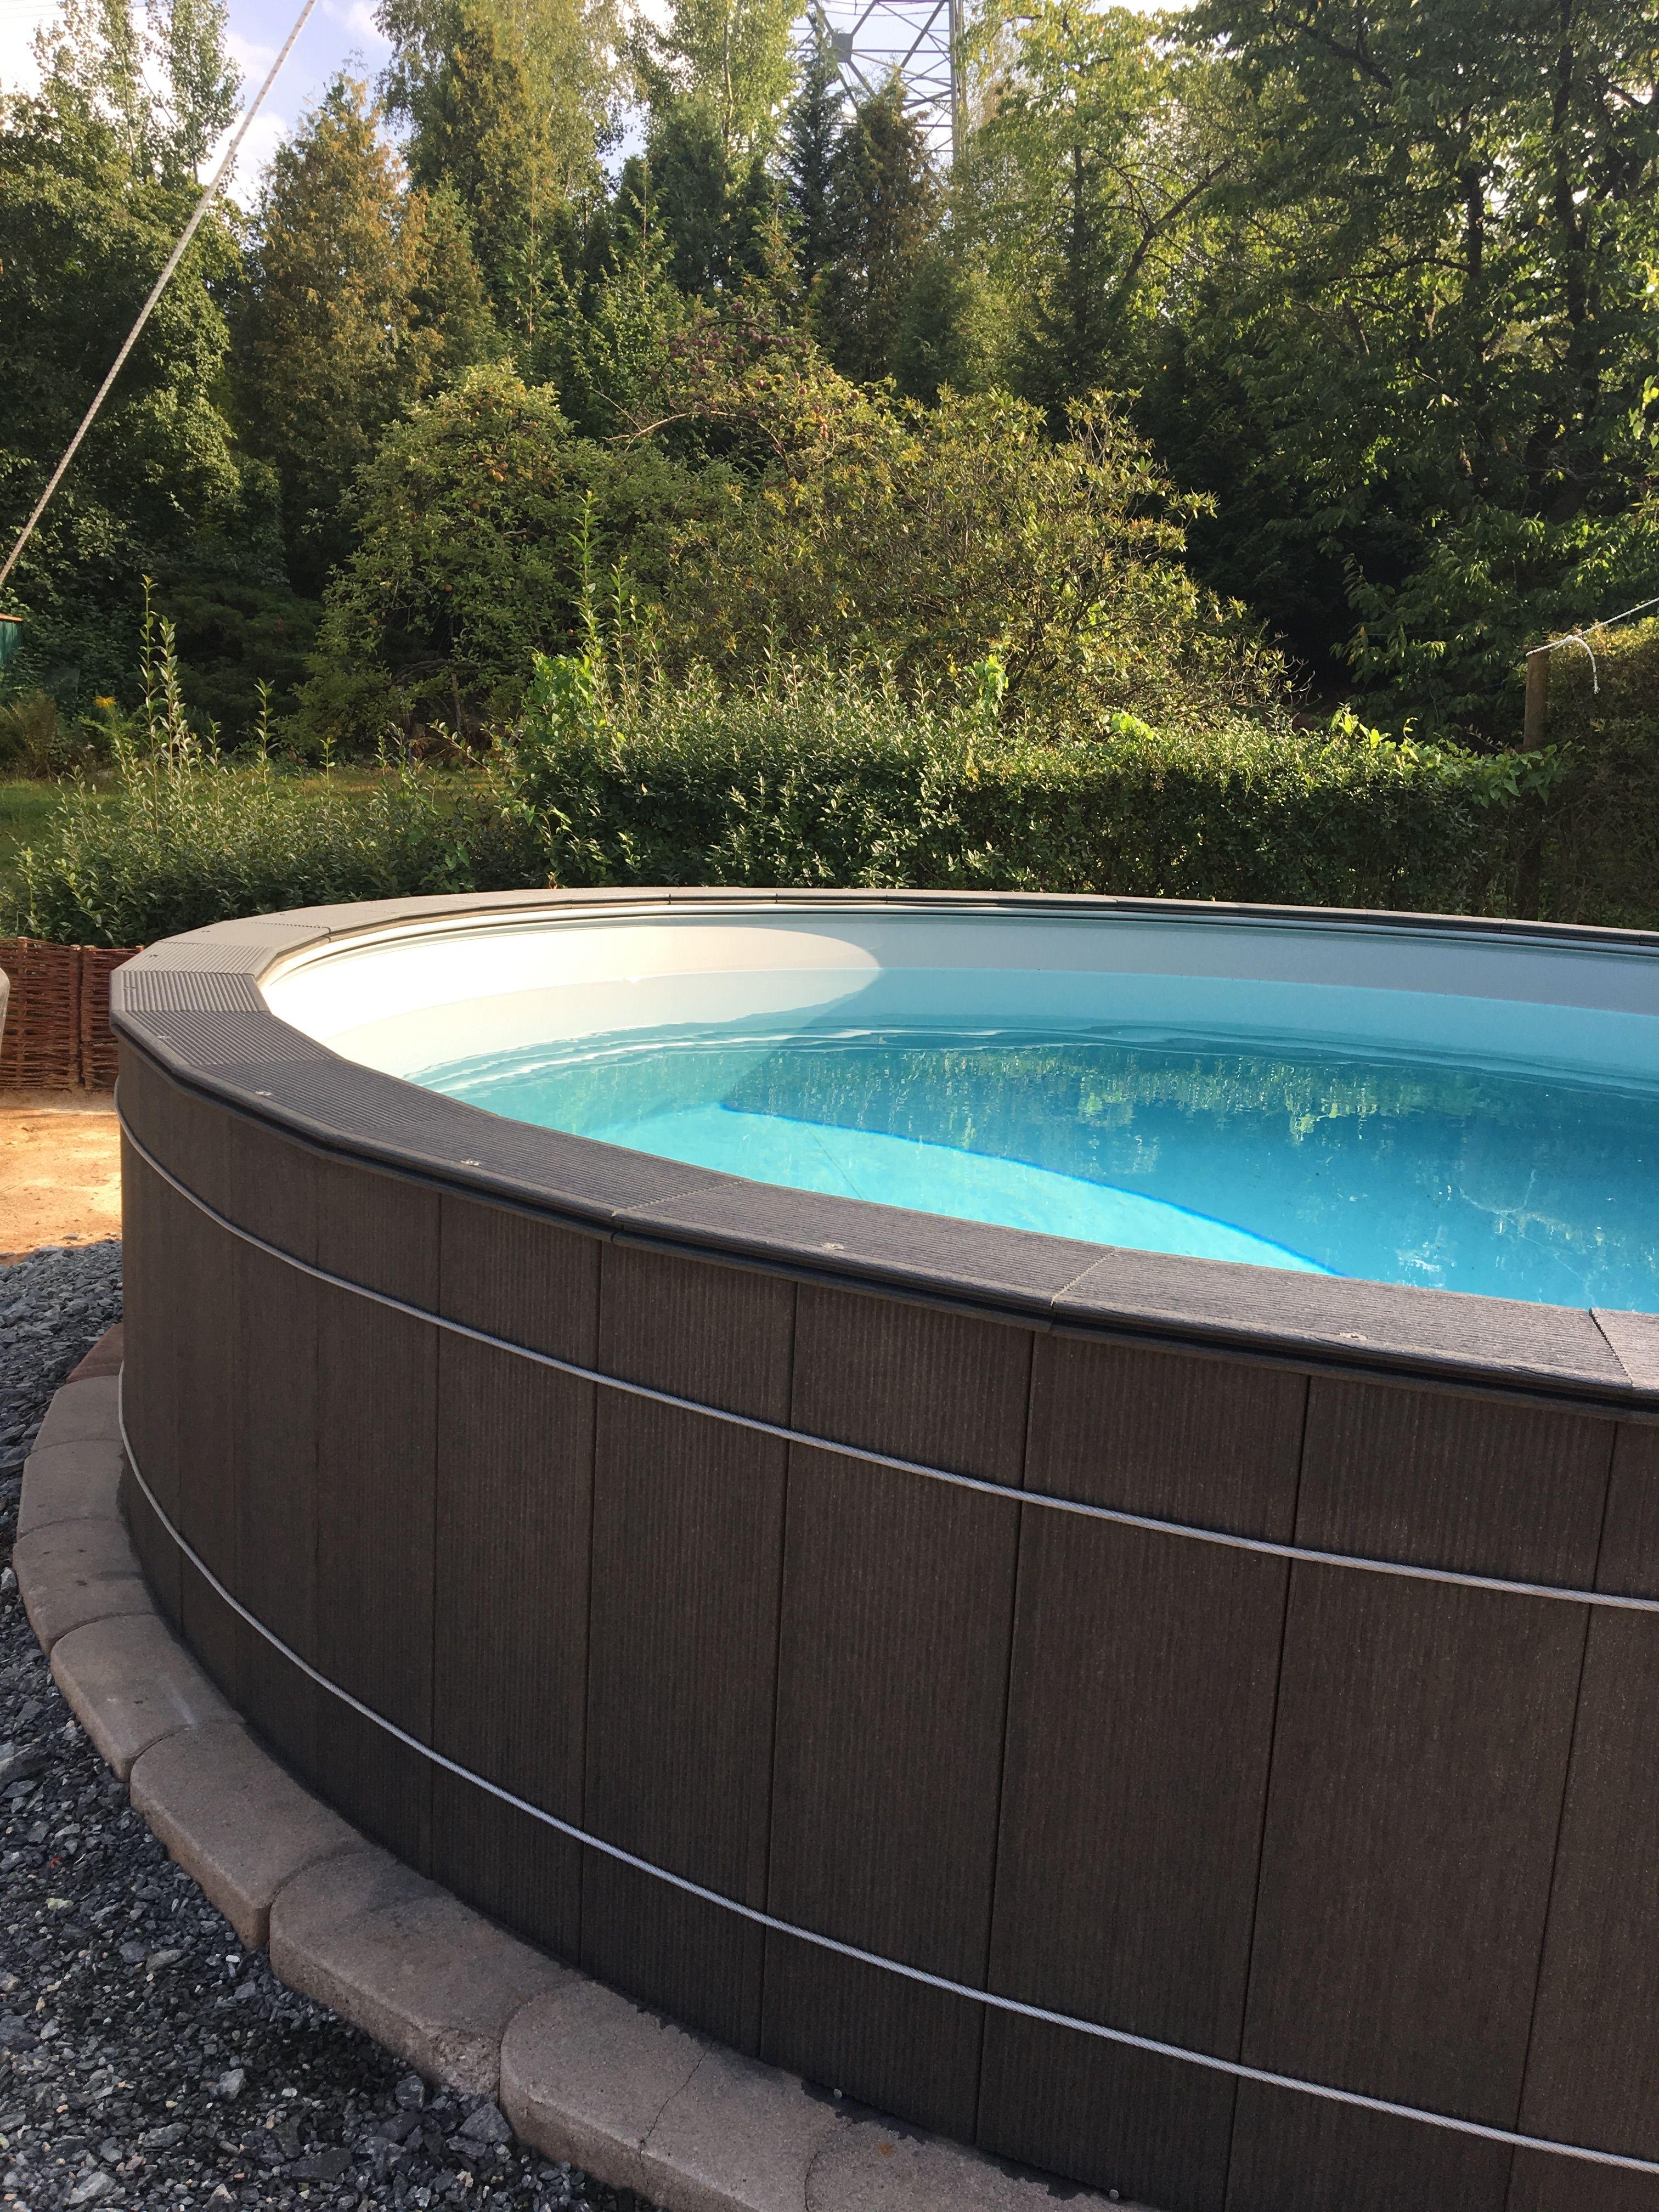 Poolumrandung Wpc Auf Conzero Gartenpools Pool Im Garten Pool Terrasse